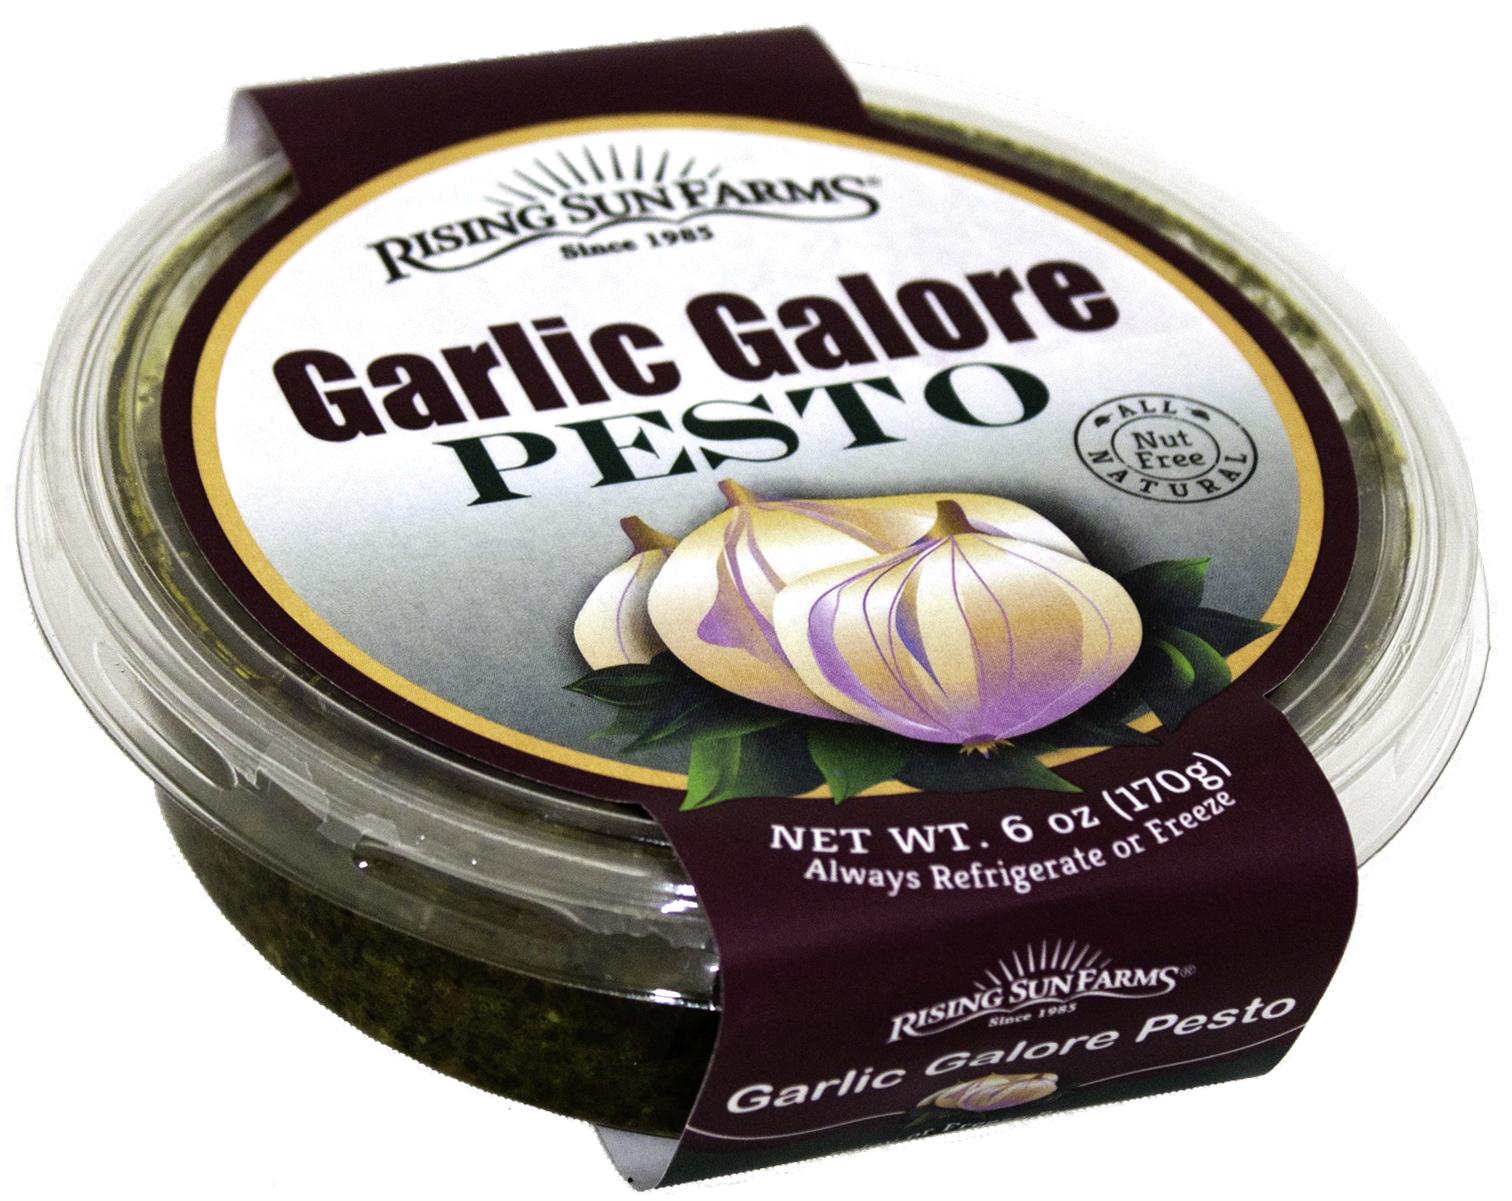 Garlic Galore Pesto 6 oz